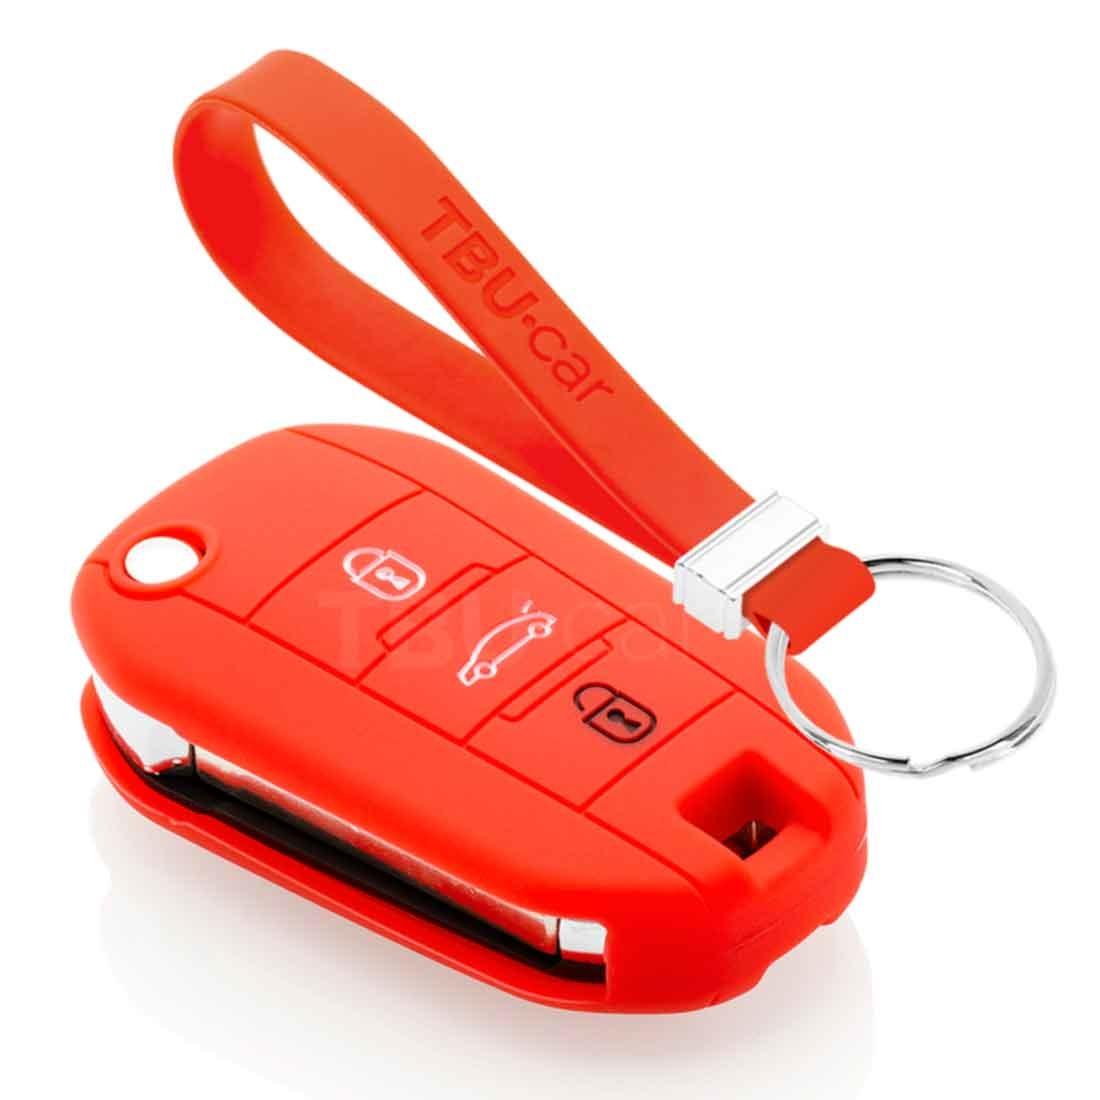 TBU car TBU car Autoschlüssel Hülle kompatibel mit Citroën 3 Tasten - Schutzhülle aus Silikon - Auto Schlüsselhülle Cover in Rot